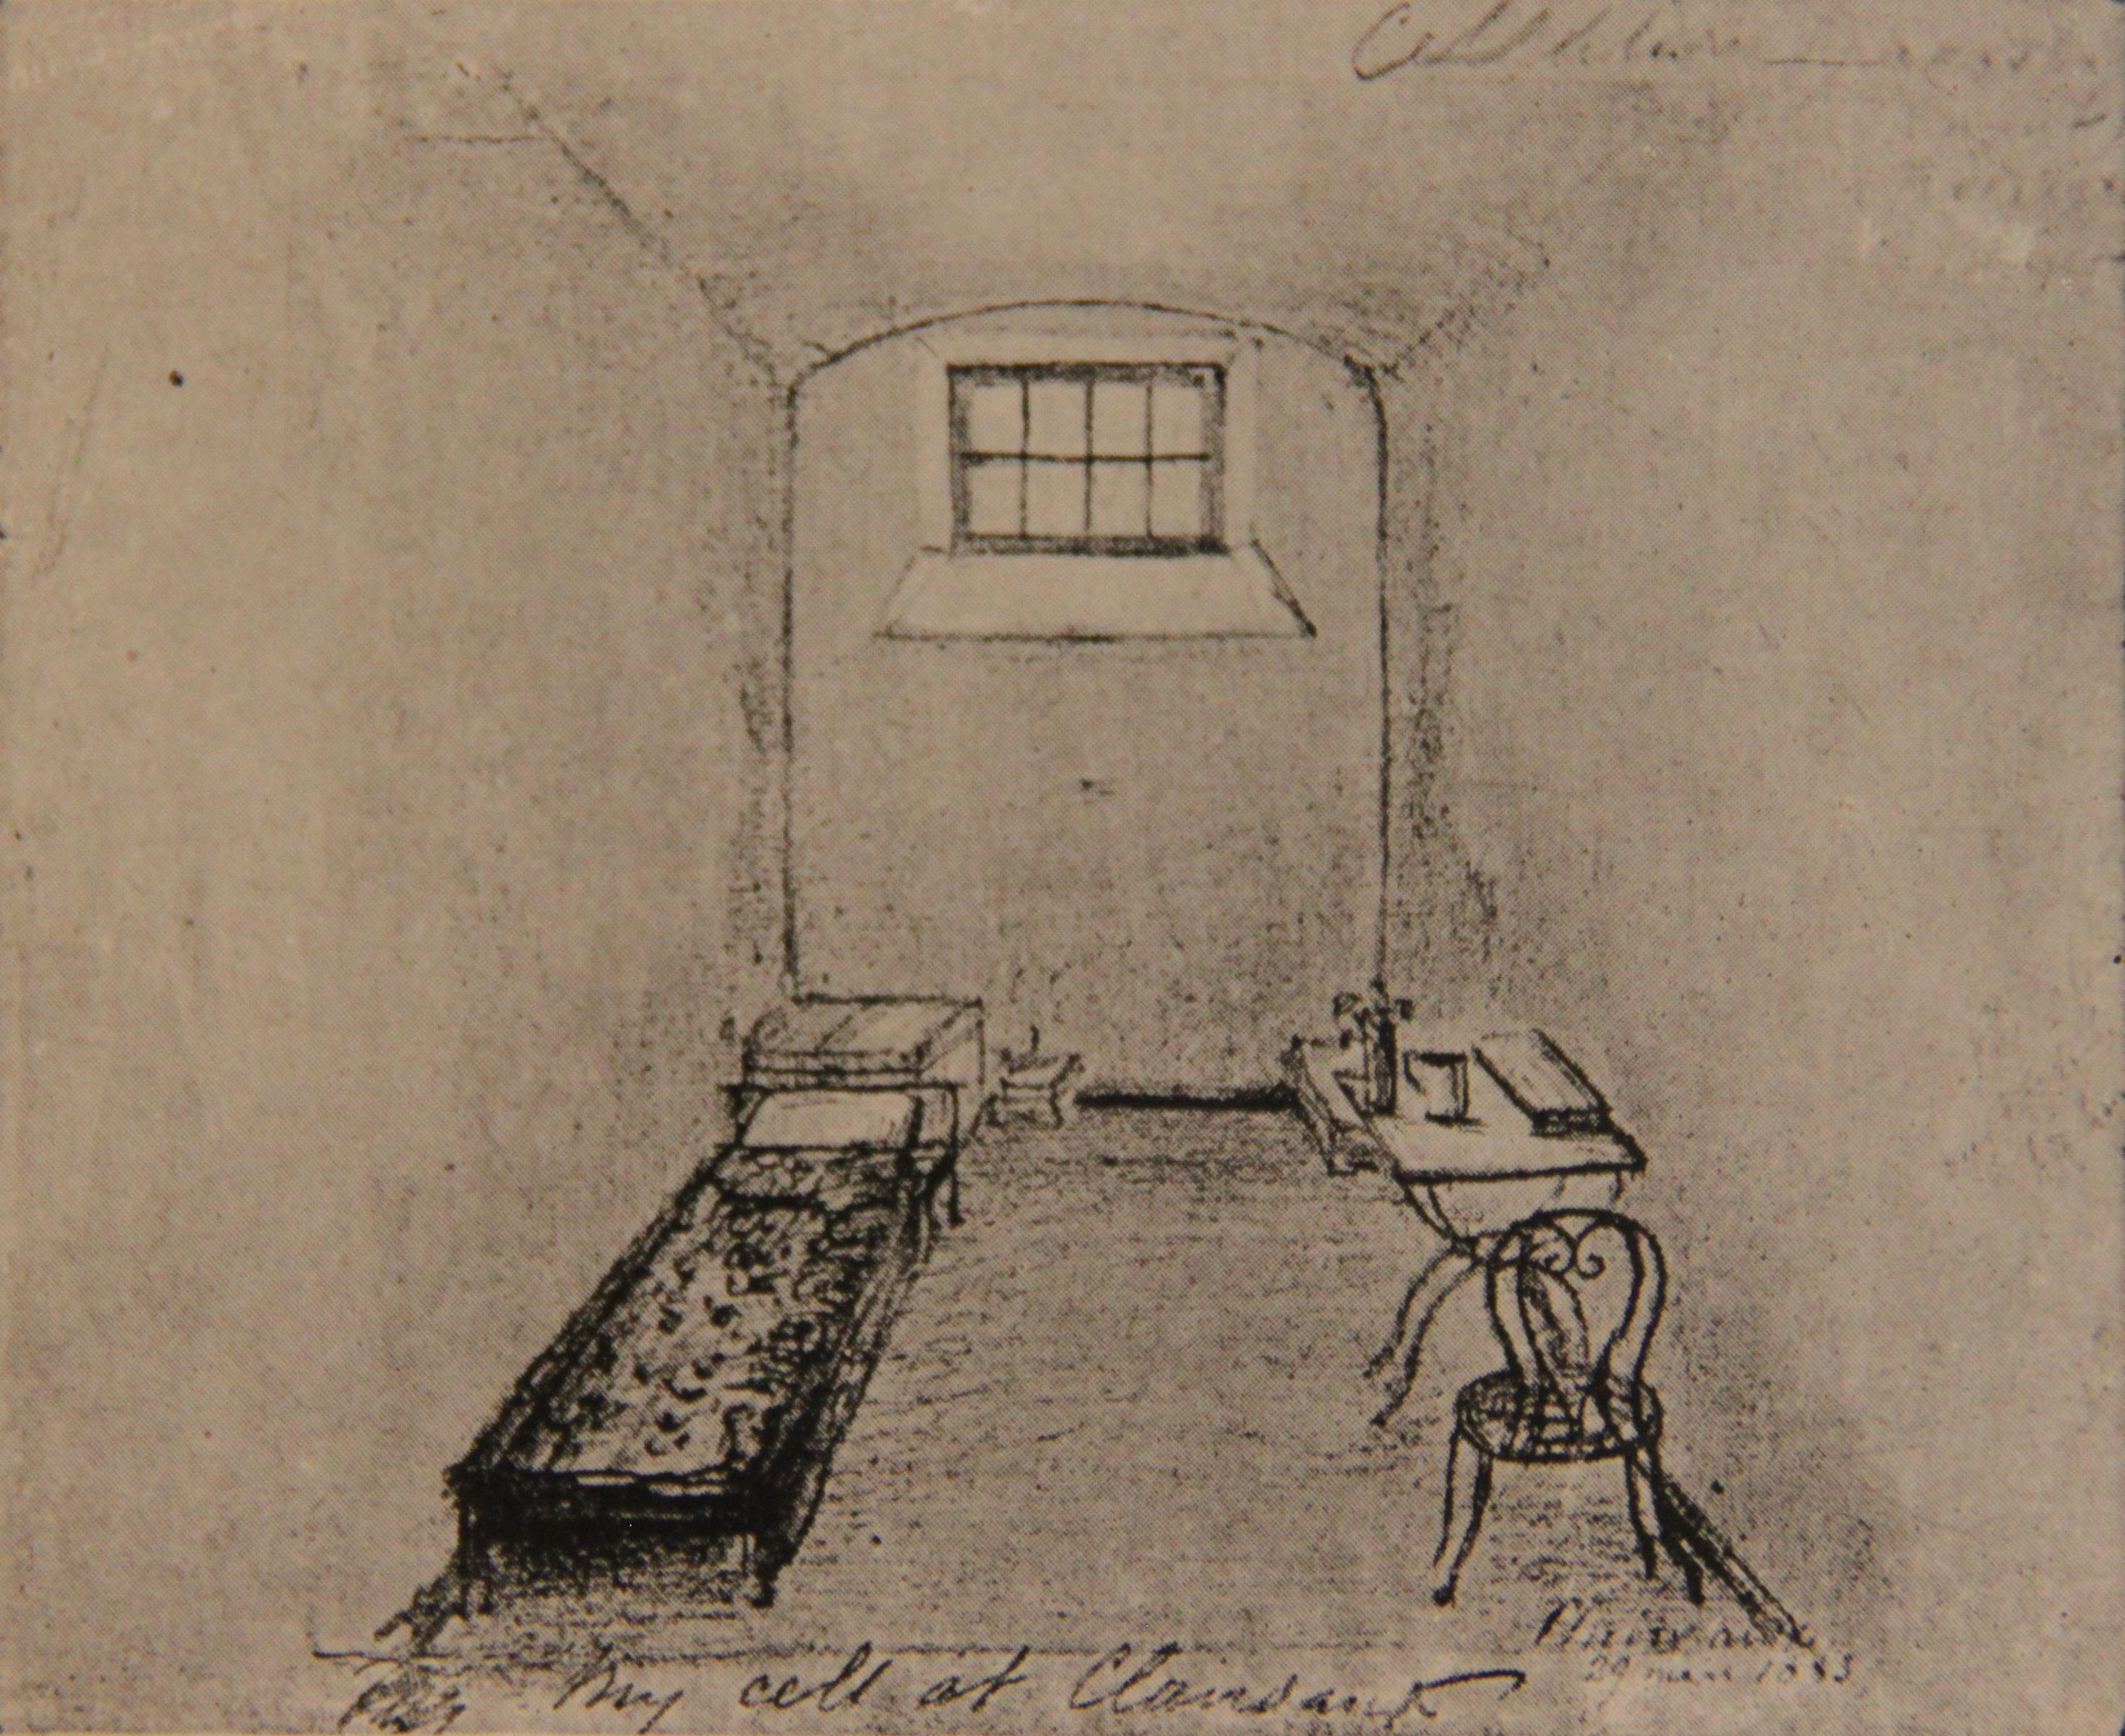 Камера П.А.Кропоткина в тюрьме Клерво, рисунок П.А.Кропоткина, 1883